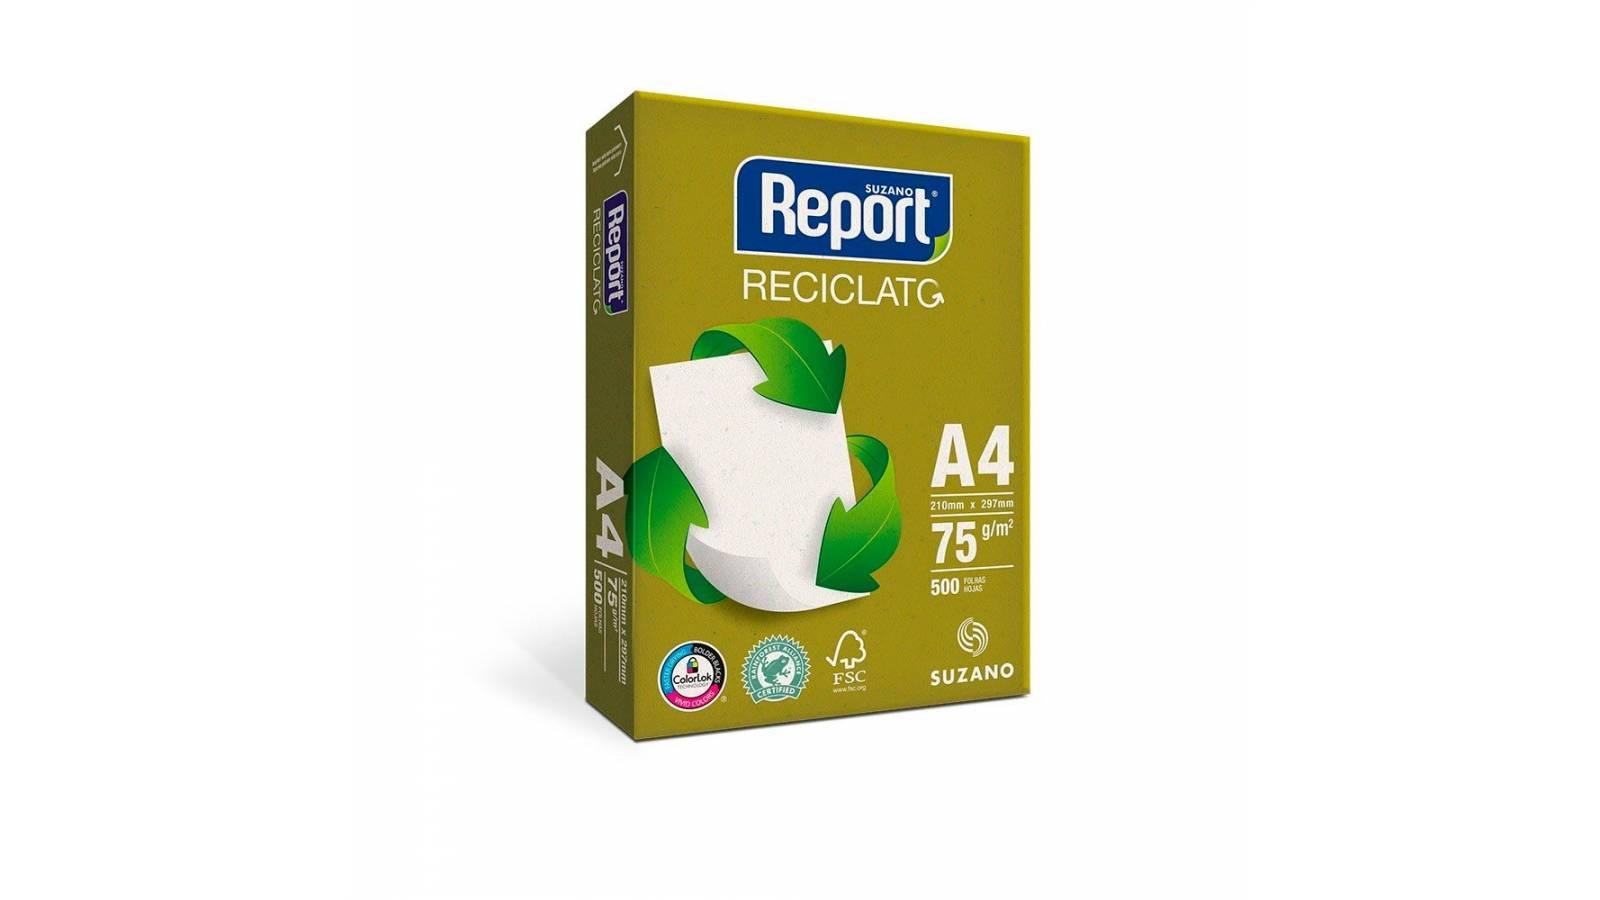 Papel A4 Report Reciclato 500 hojas - 75 Grs